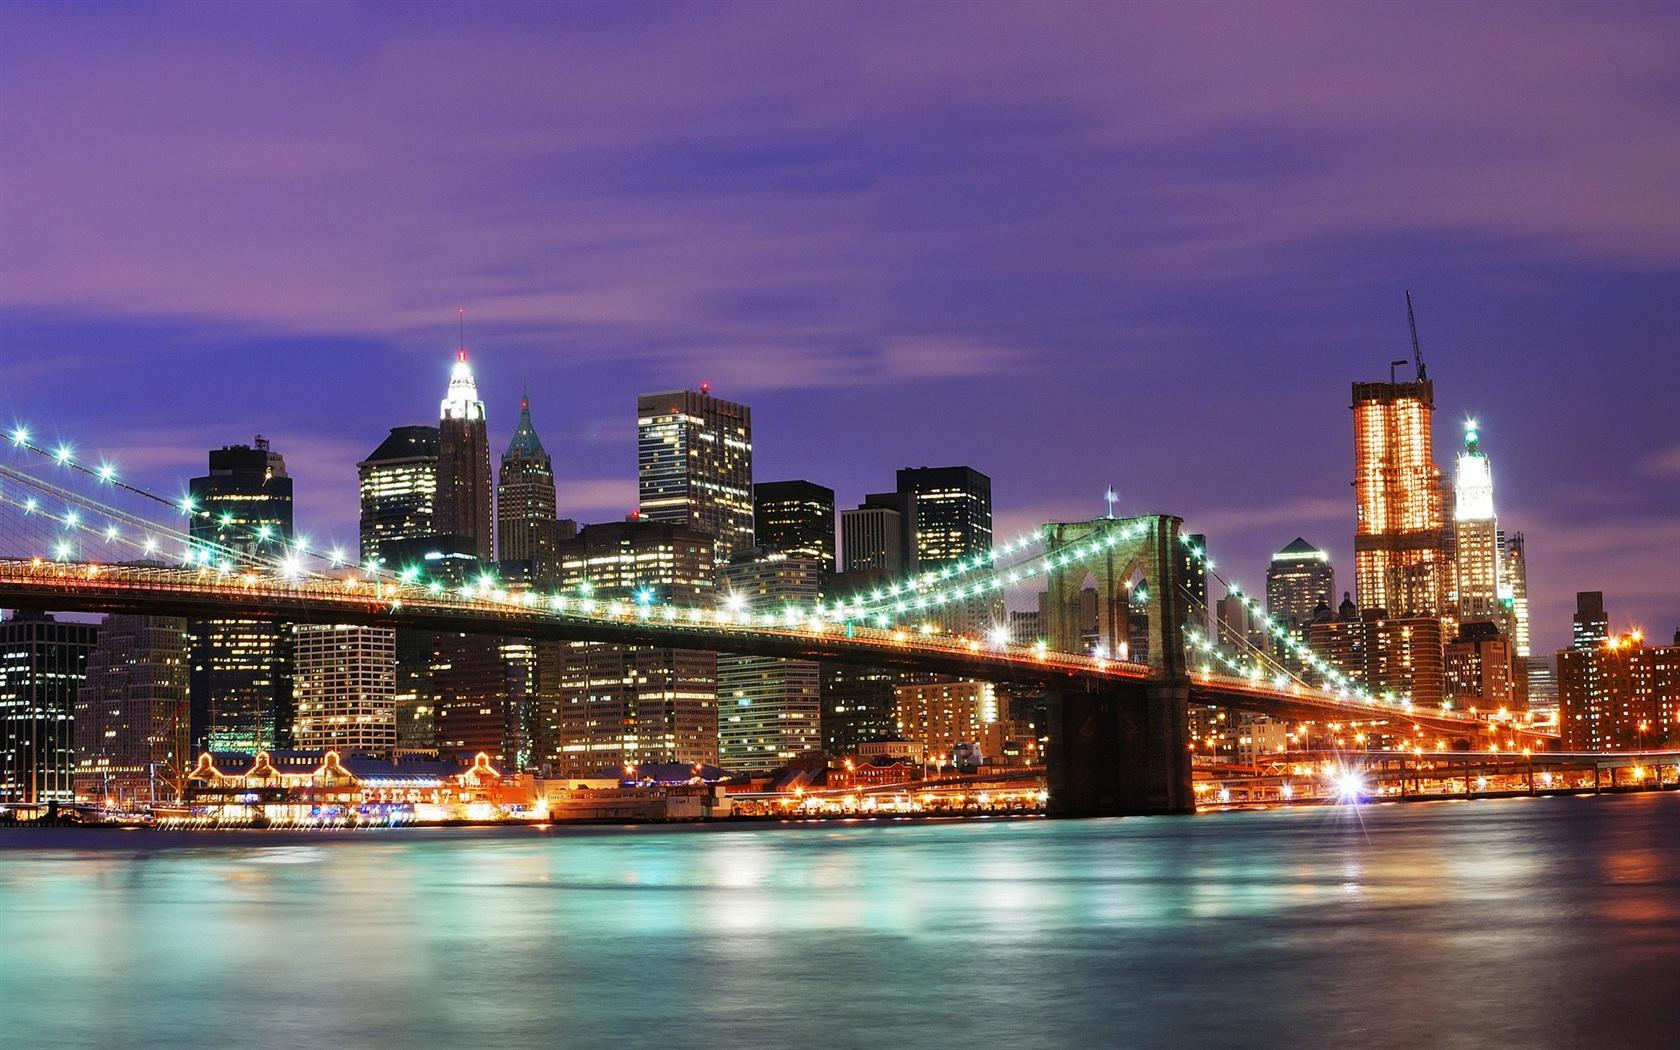 Fonds d 39 cran etats unis new york la nuit 1920x1200 hd image for Immagini desktop new york